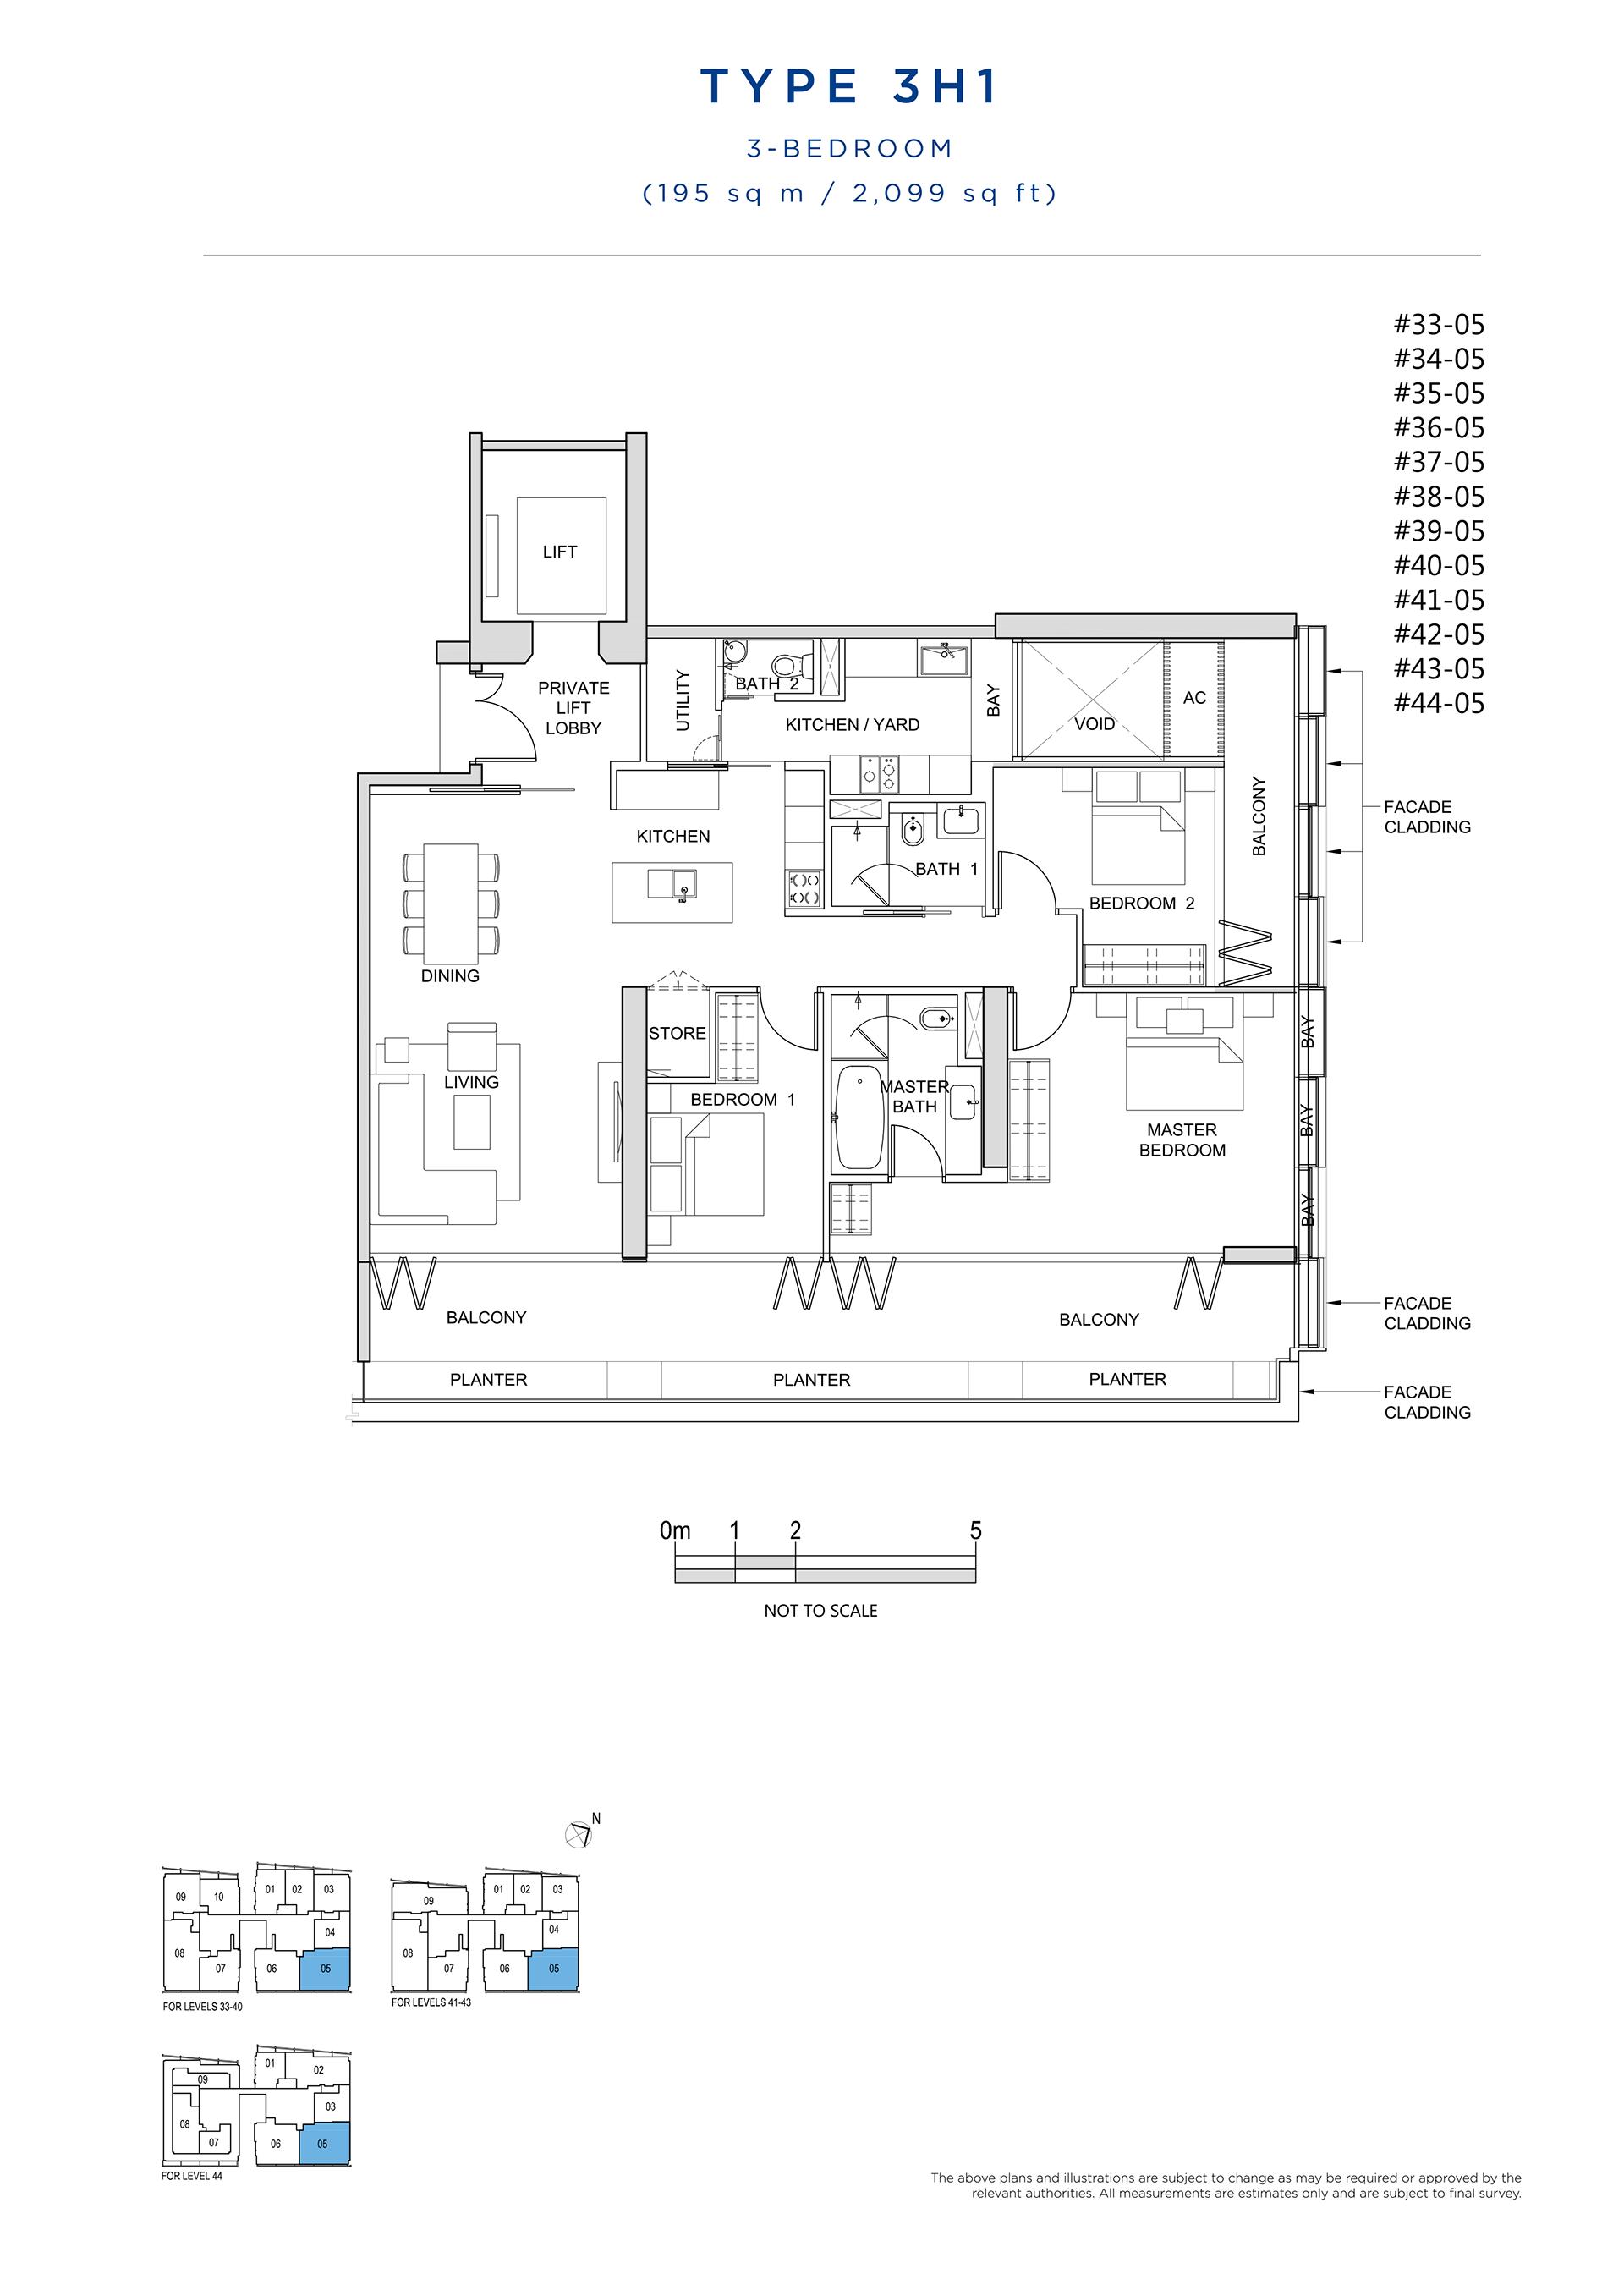 South Beach Residences 3 Bedroom Floor Plan Type 3H1